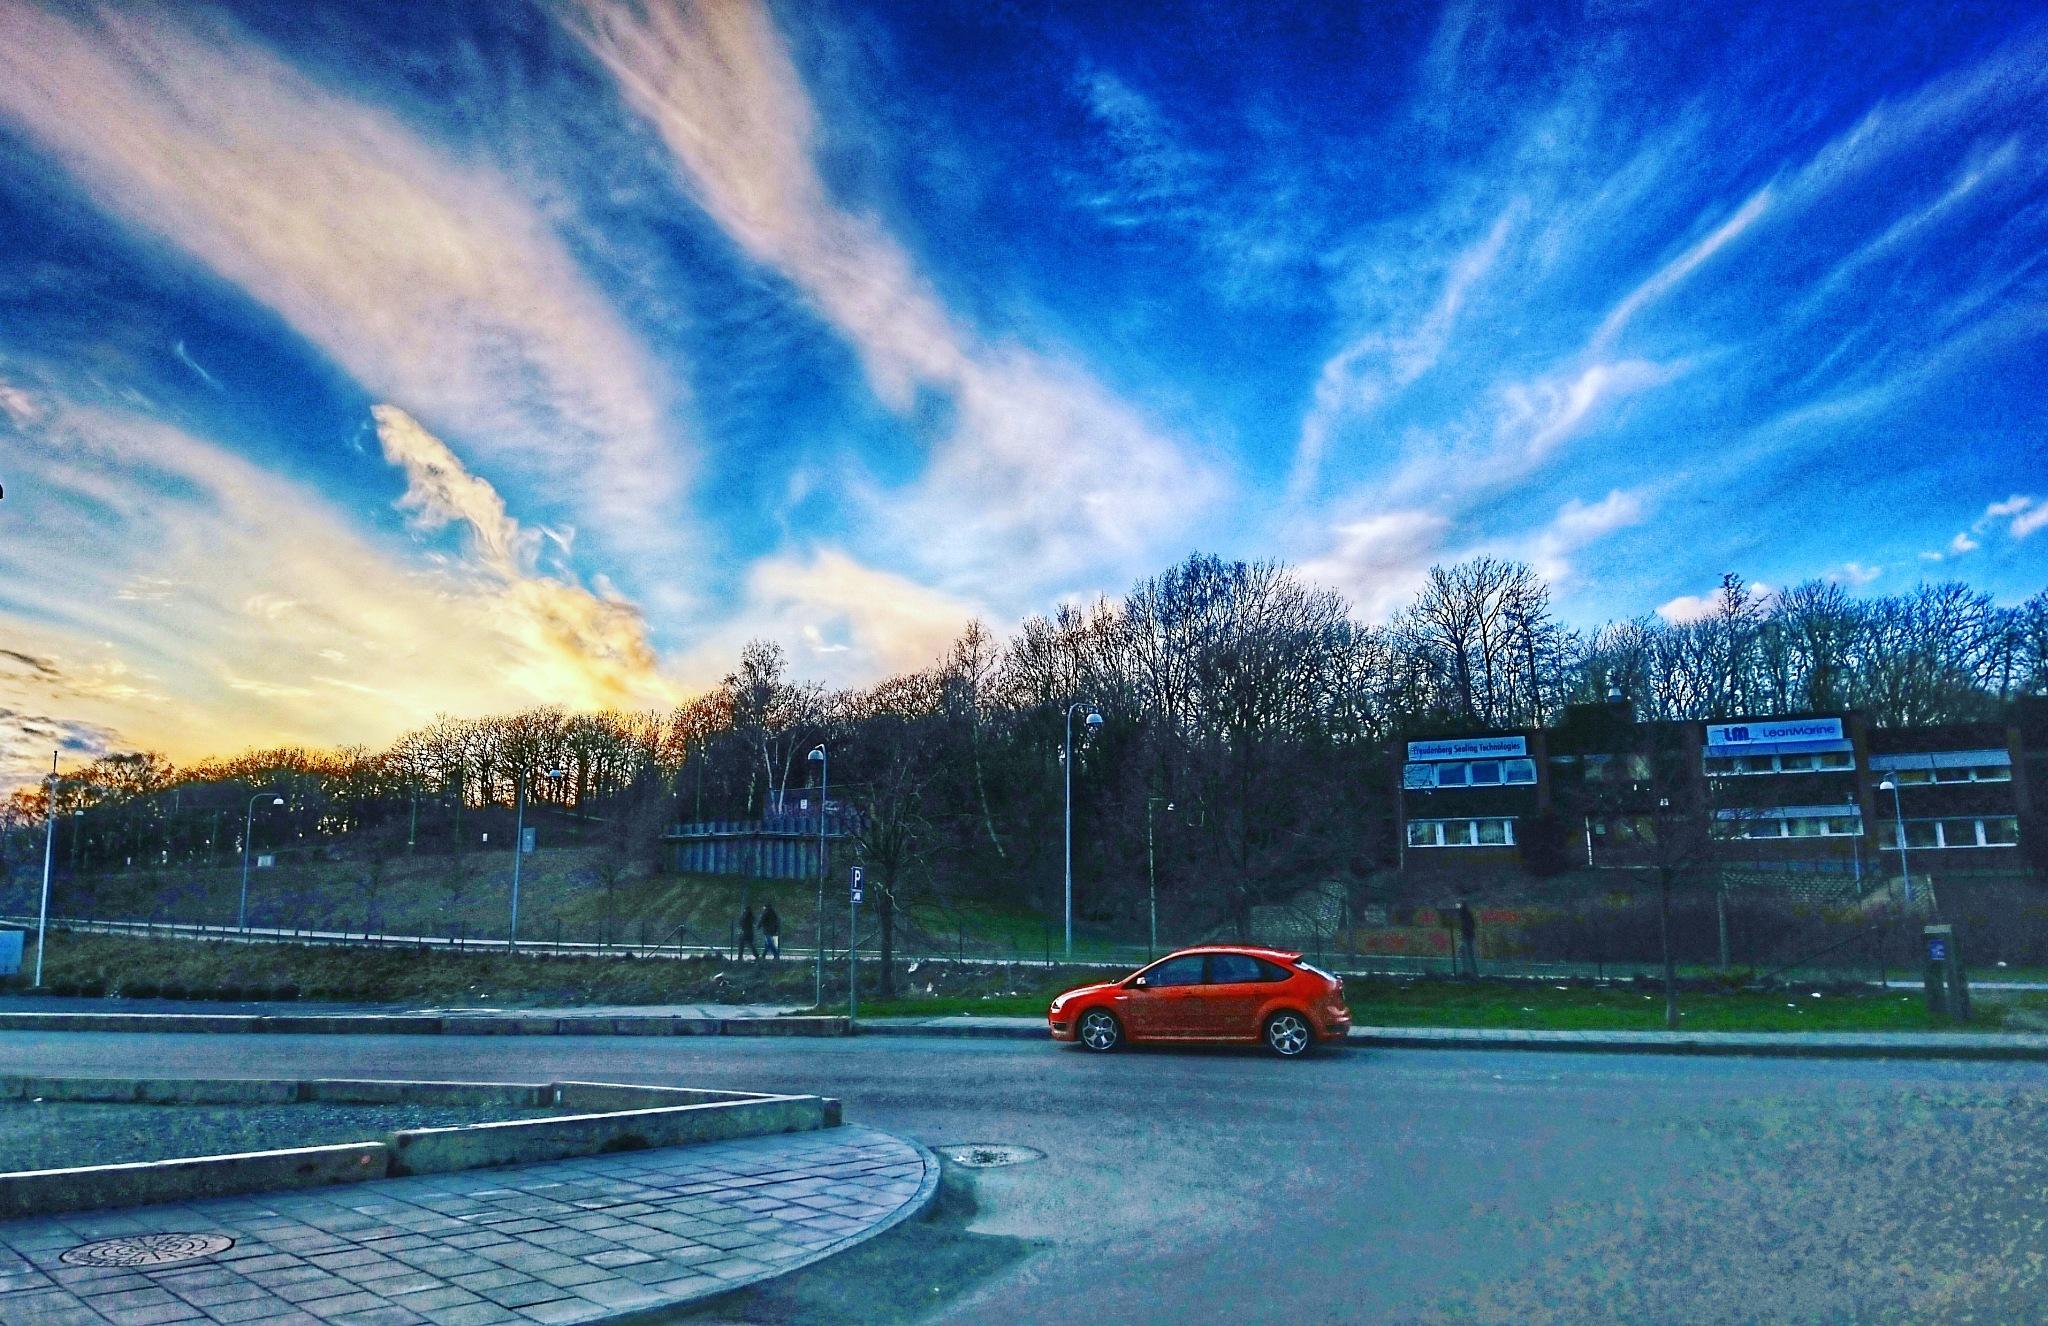 Red car by Krister Honkonen